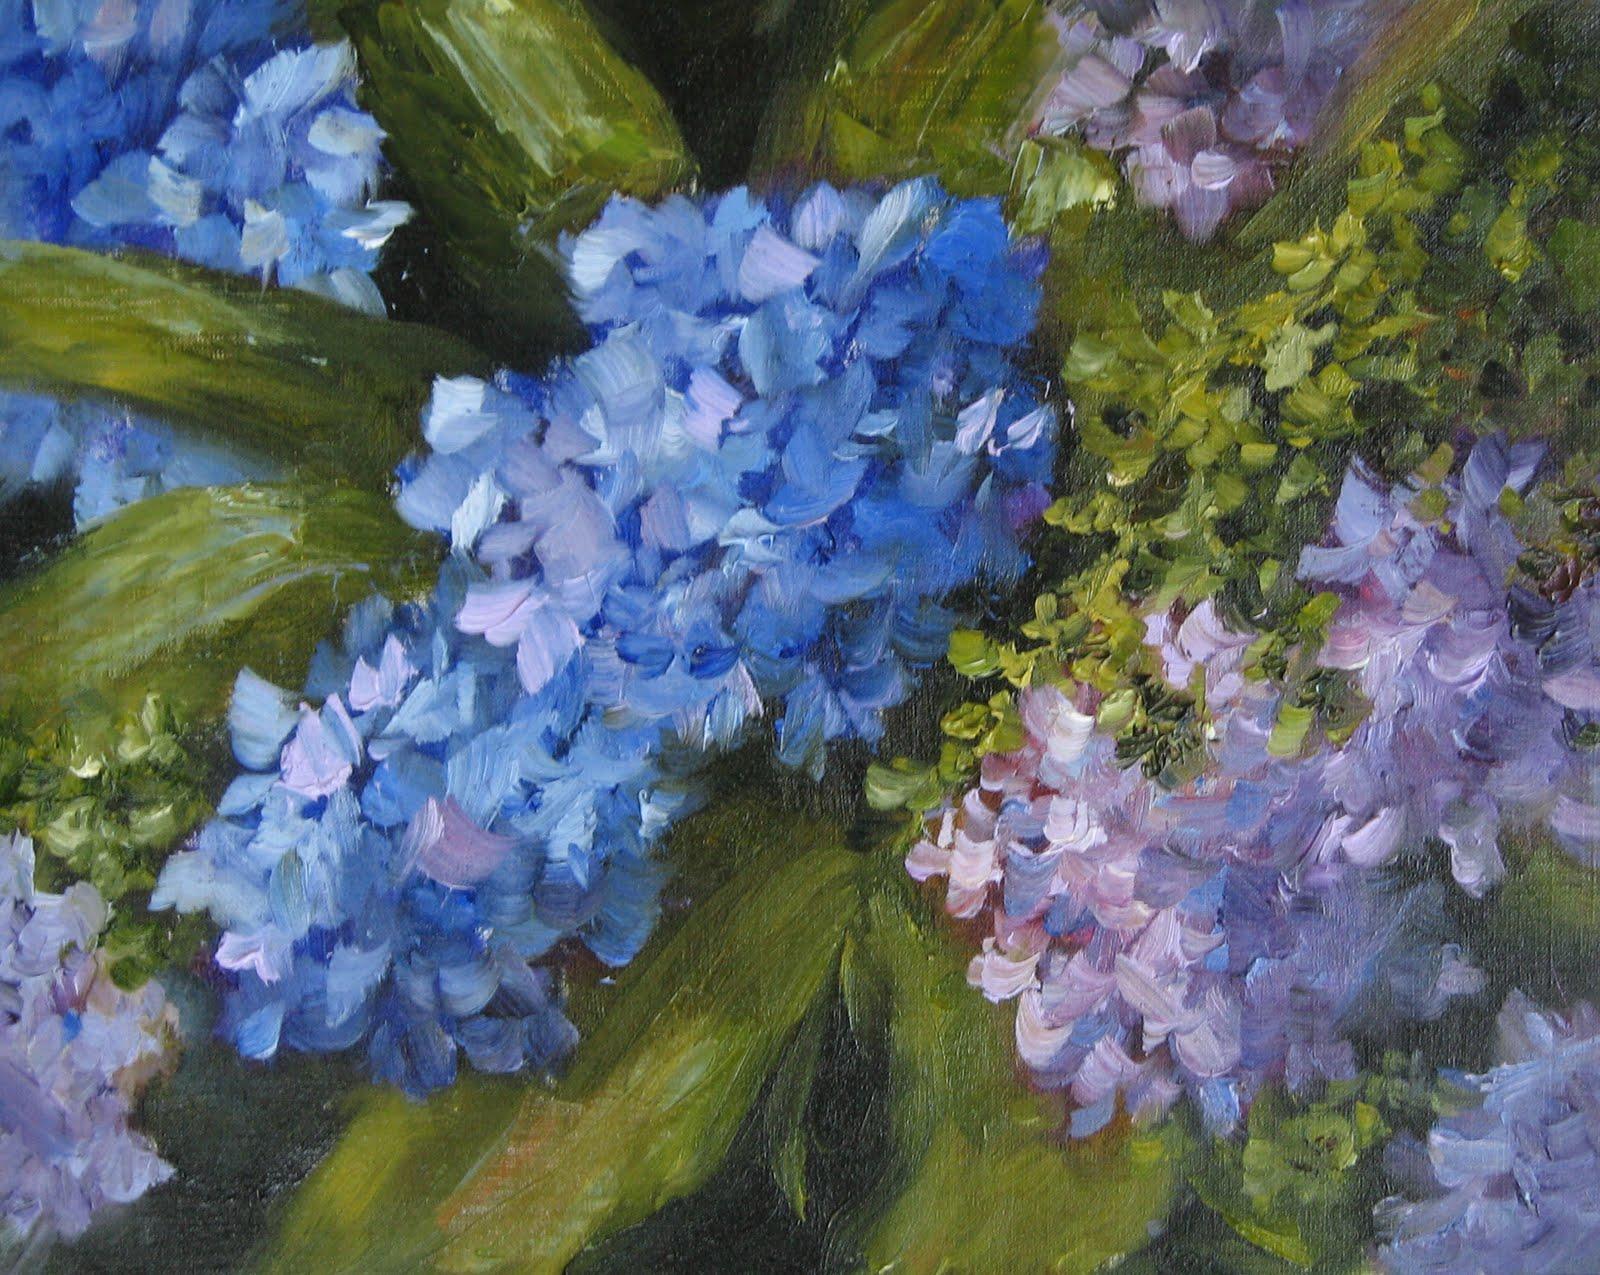 """Flower Study #10 Hydrangeas"" original fine art by Pat Fiorello"